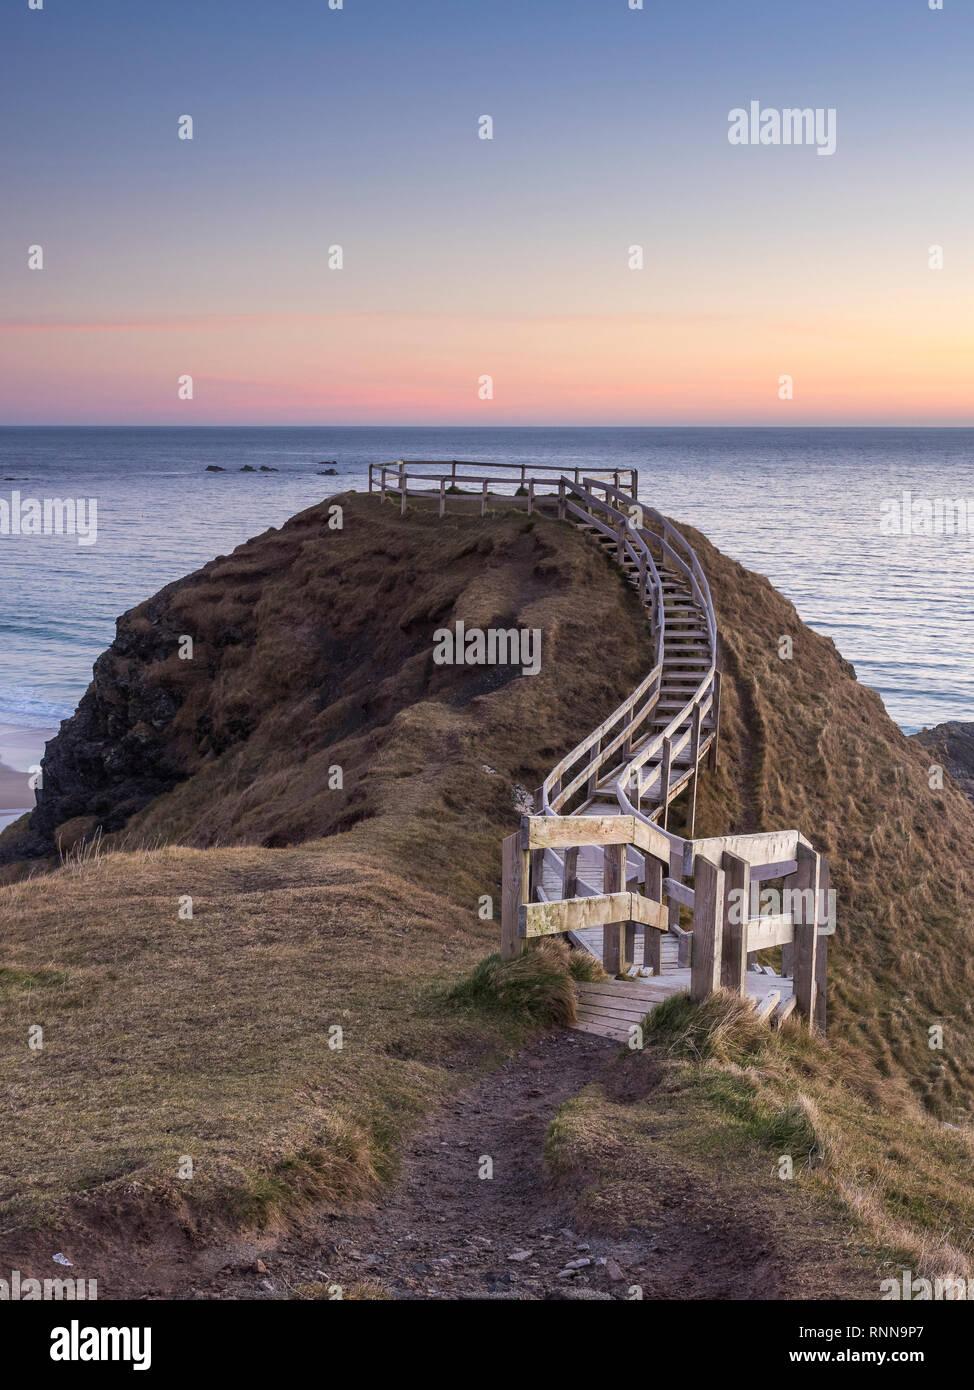 Viewpoint boardwalk at Sango Bay, Durness, Sutherland, Scotland - Stock Image